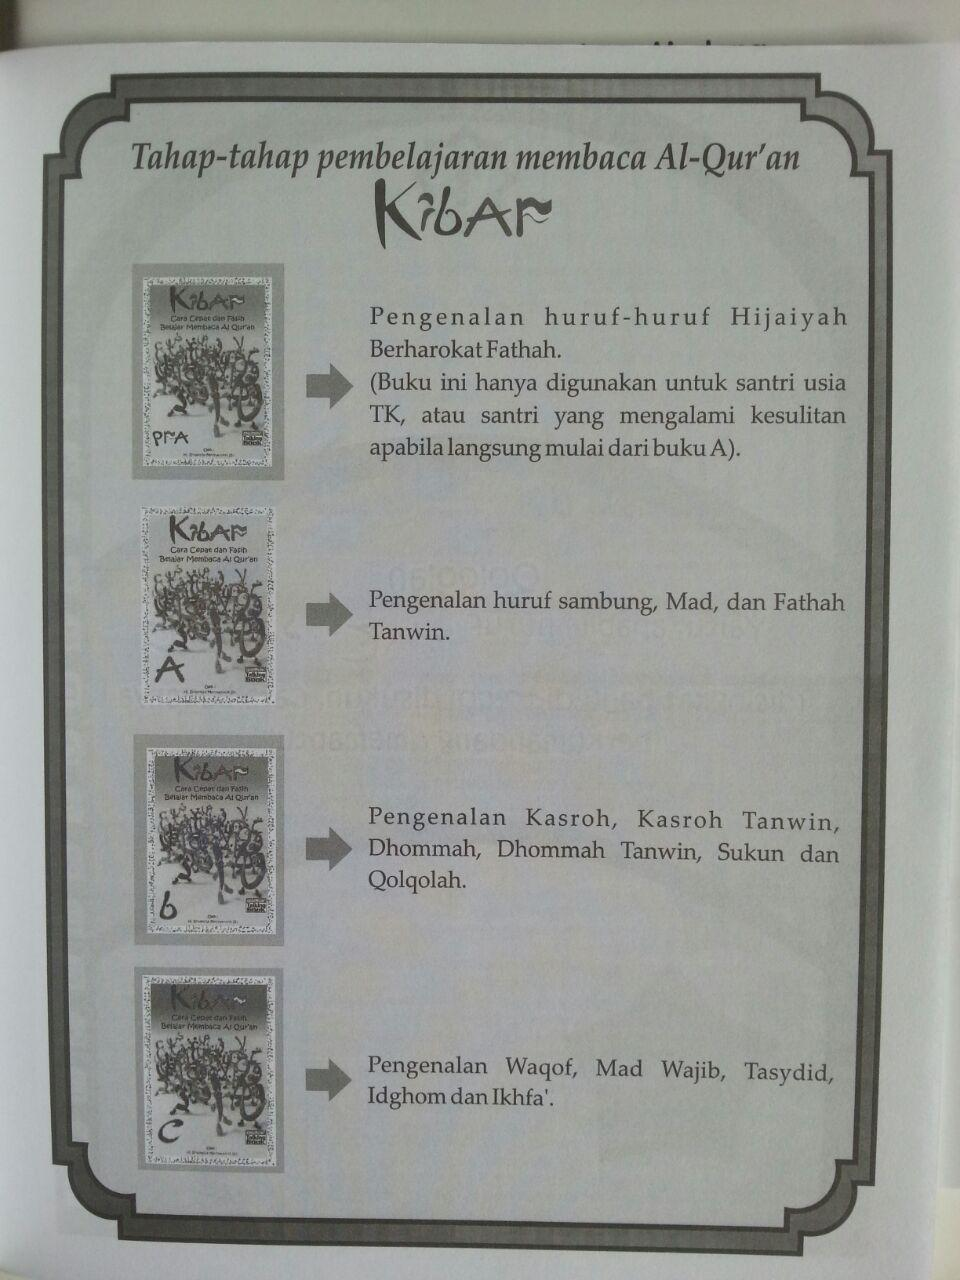 Buku Kibar Cara Cepat Dan Fasih Belajar Membaca Al-Qur'an A5 Set isi 2